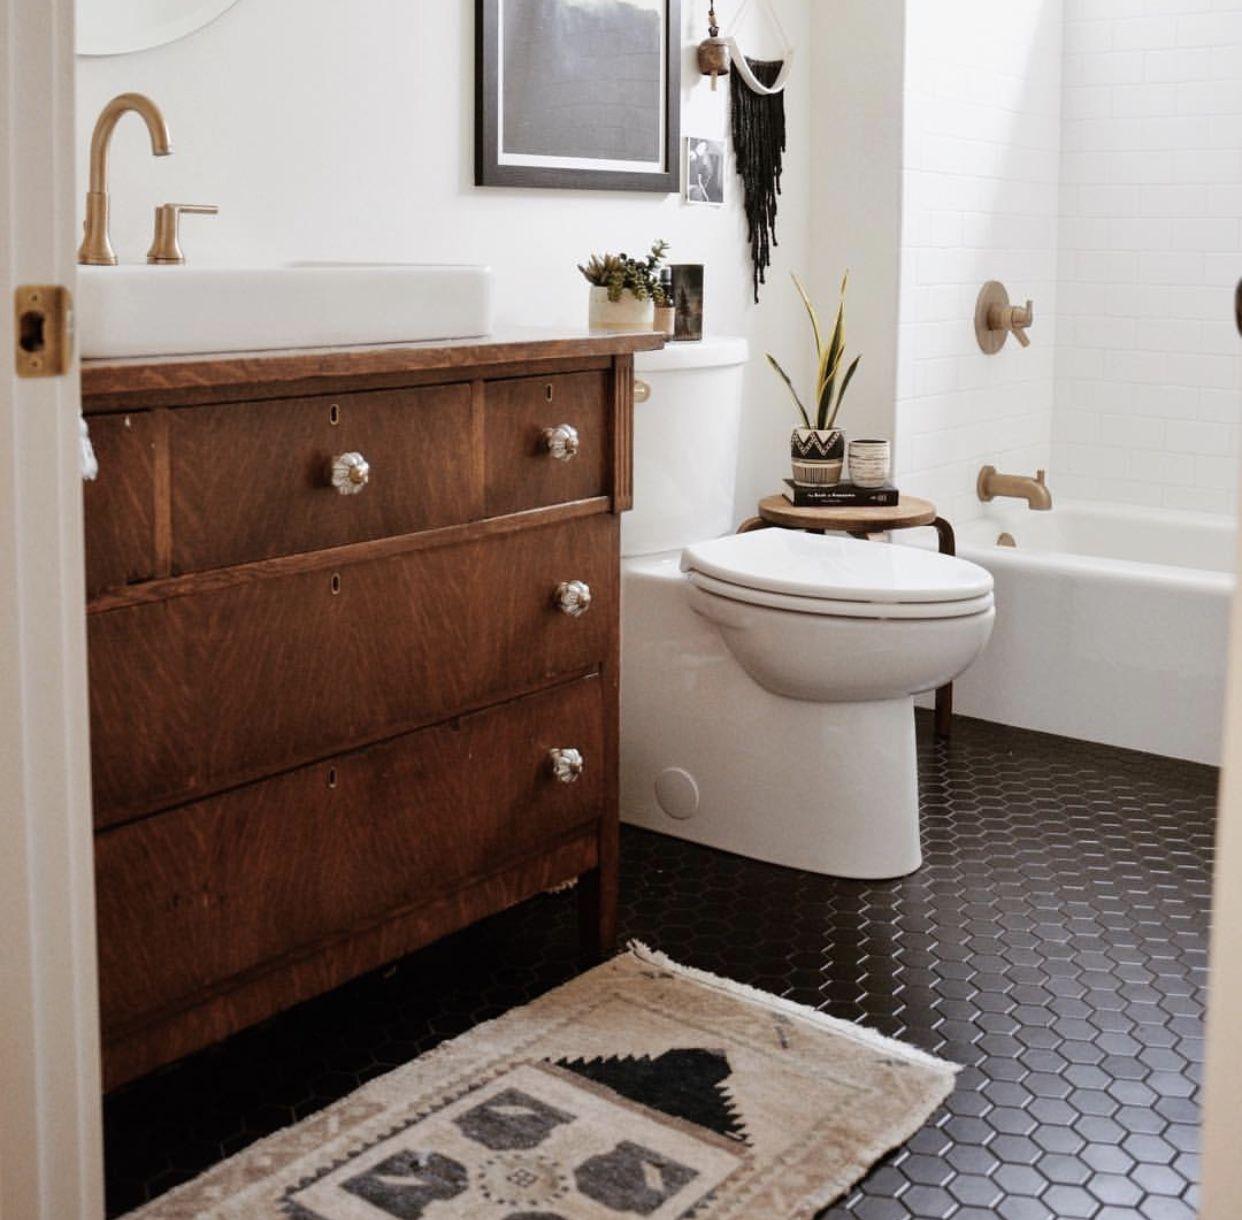 Pin van Caroline Murry op Dreamy Bathrooms | Pinterest - Wc ...